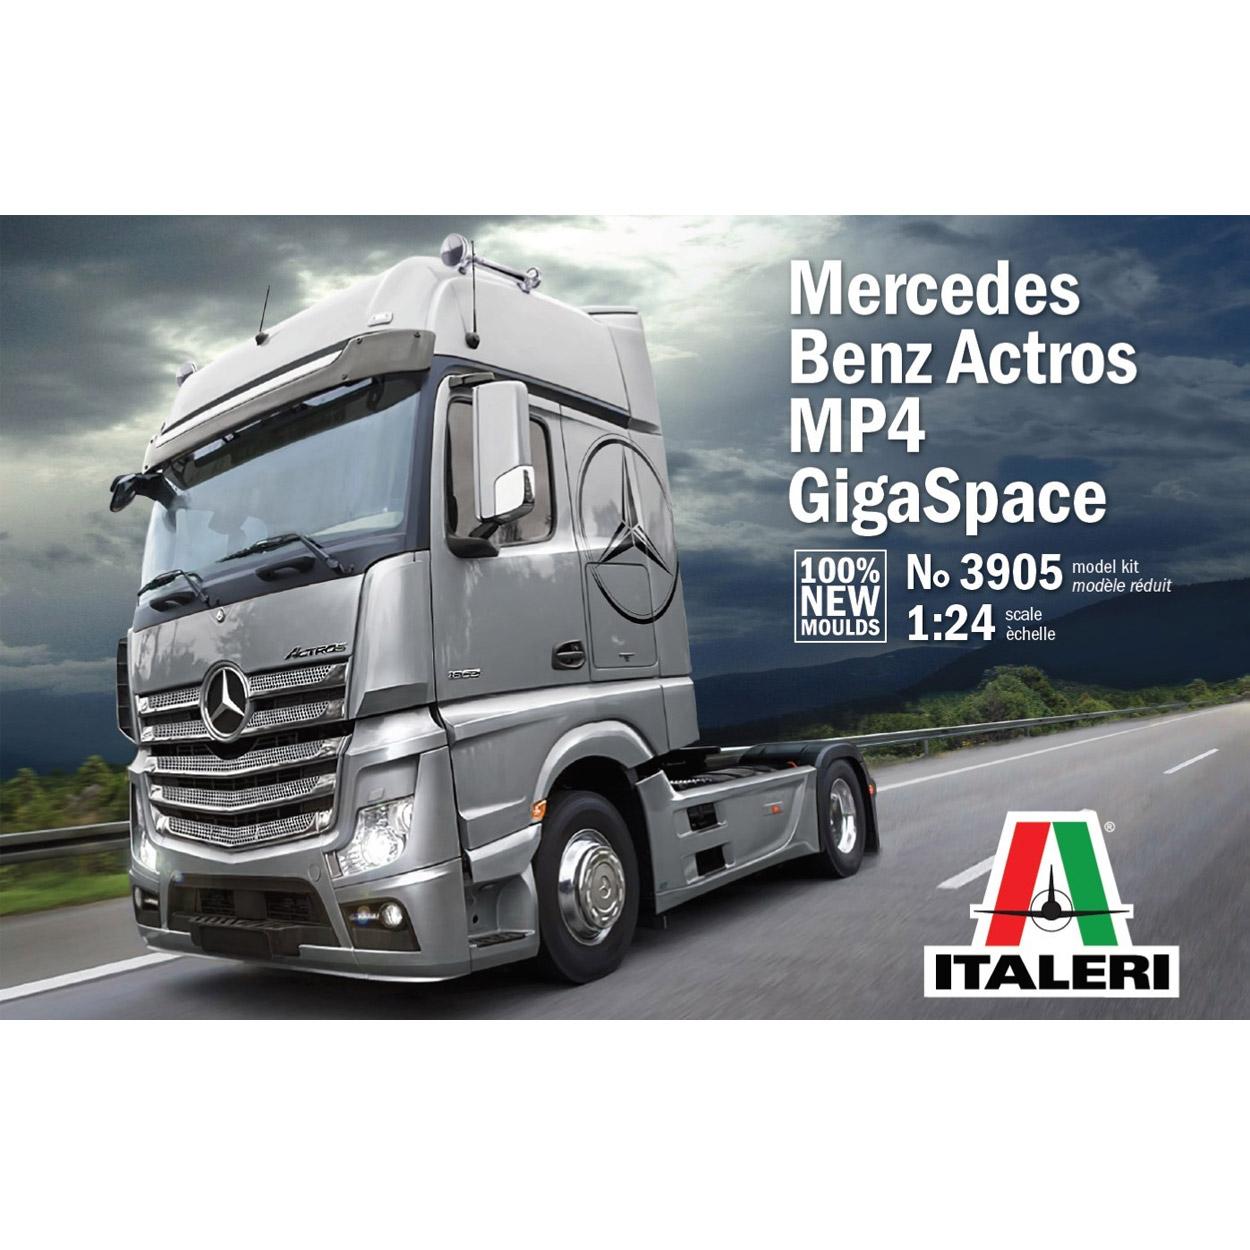 Mercédes-Benz Actros MP4 GigaSpace